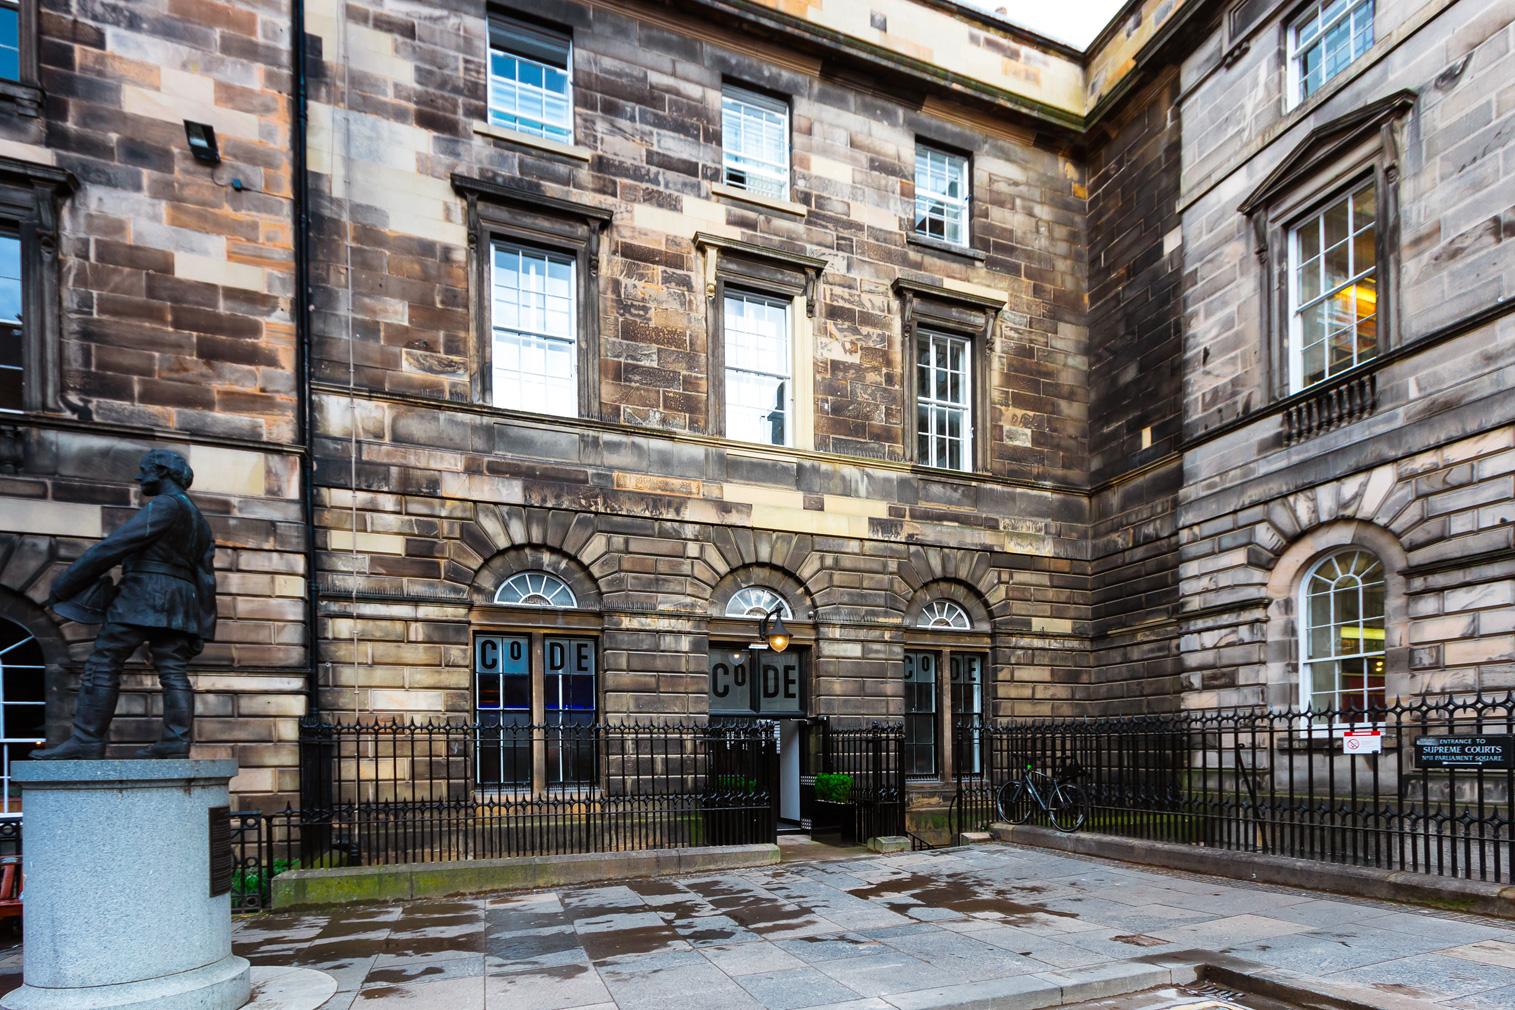 The Court, CODE Pod Hostels Edinburgh